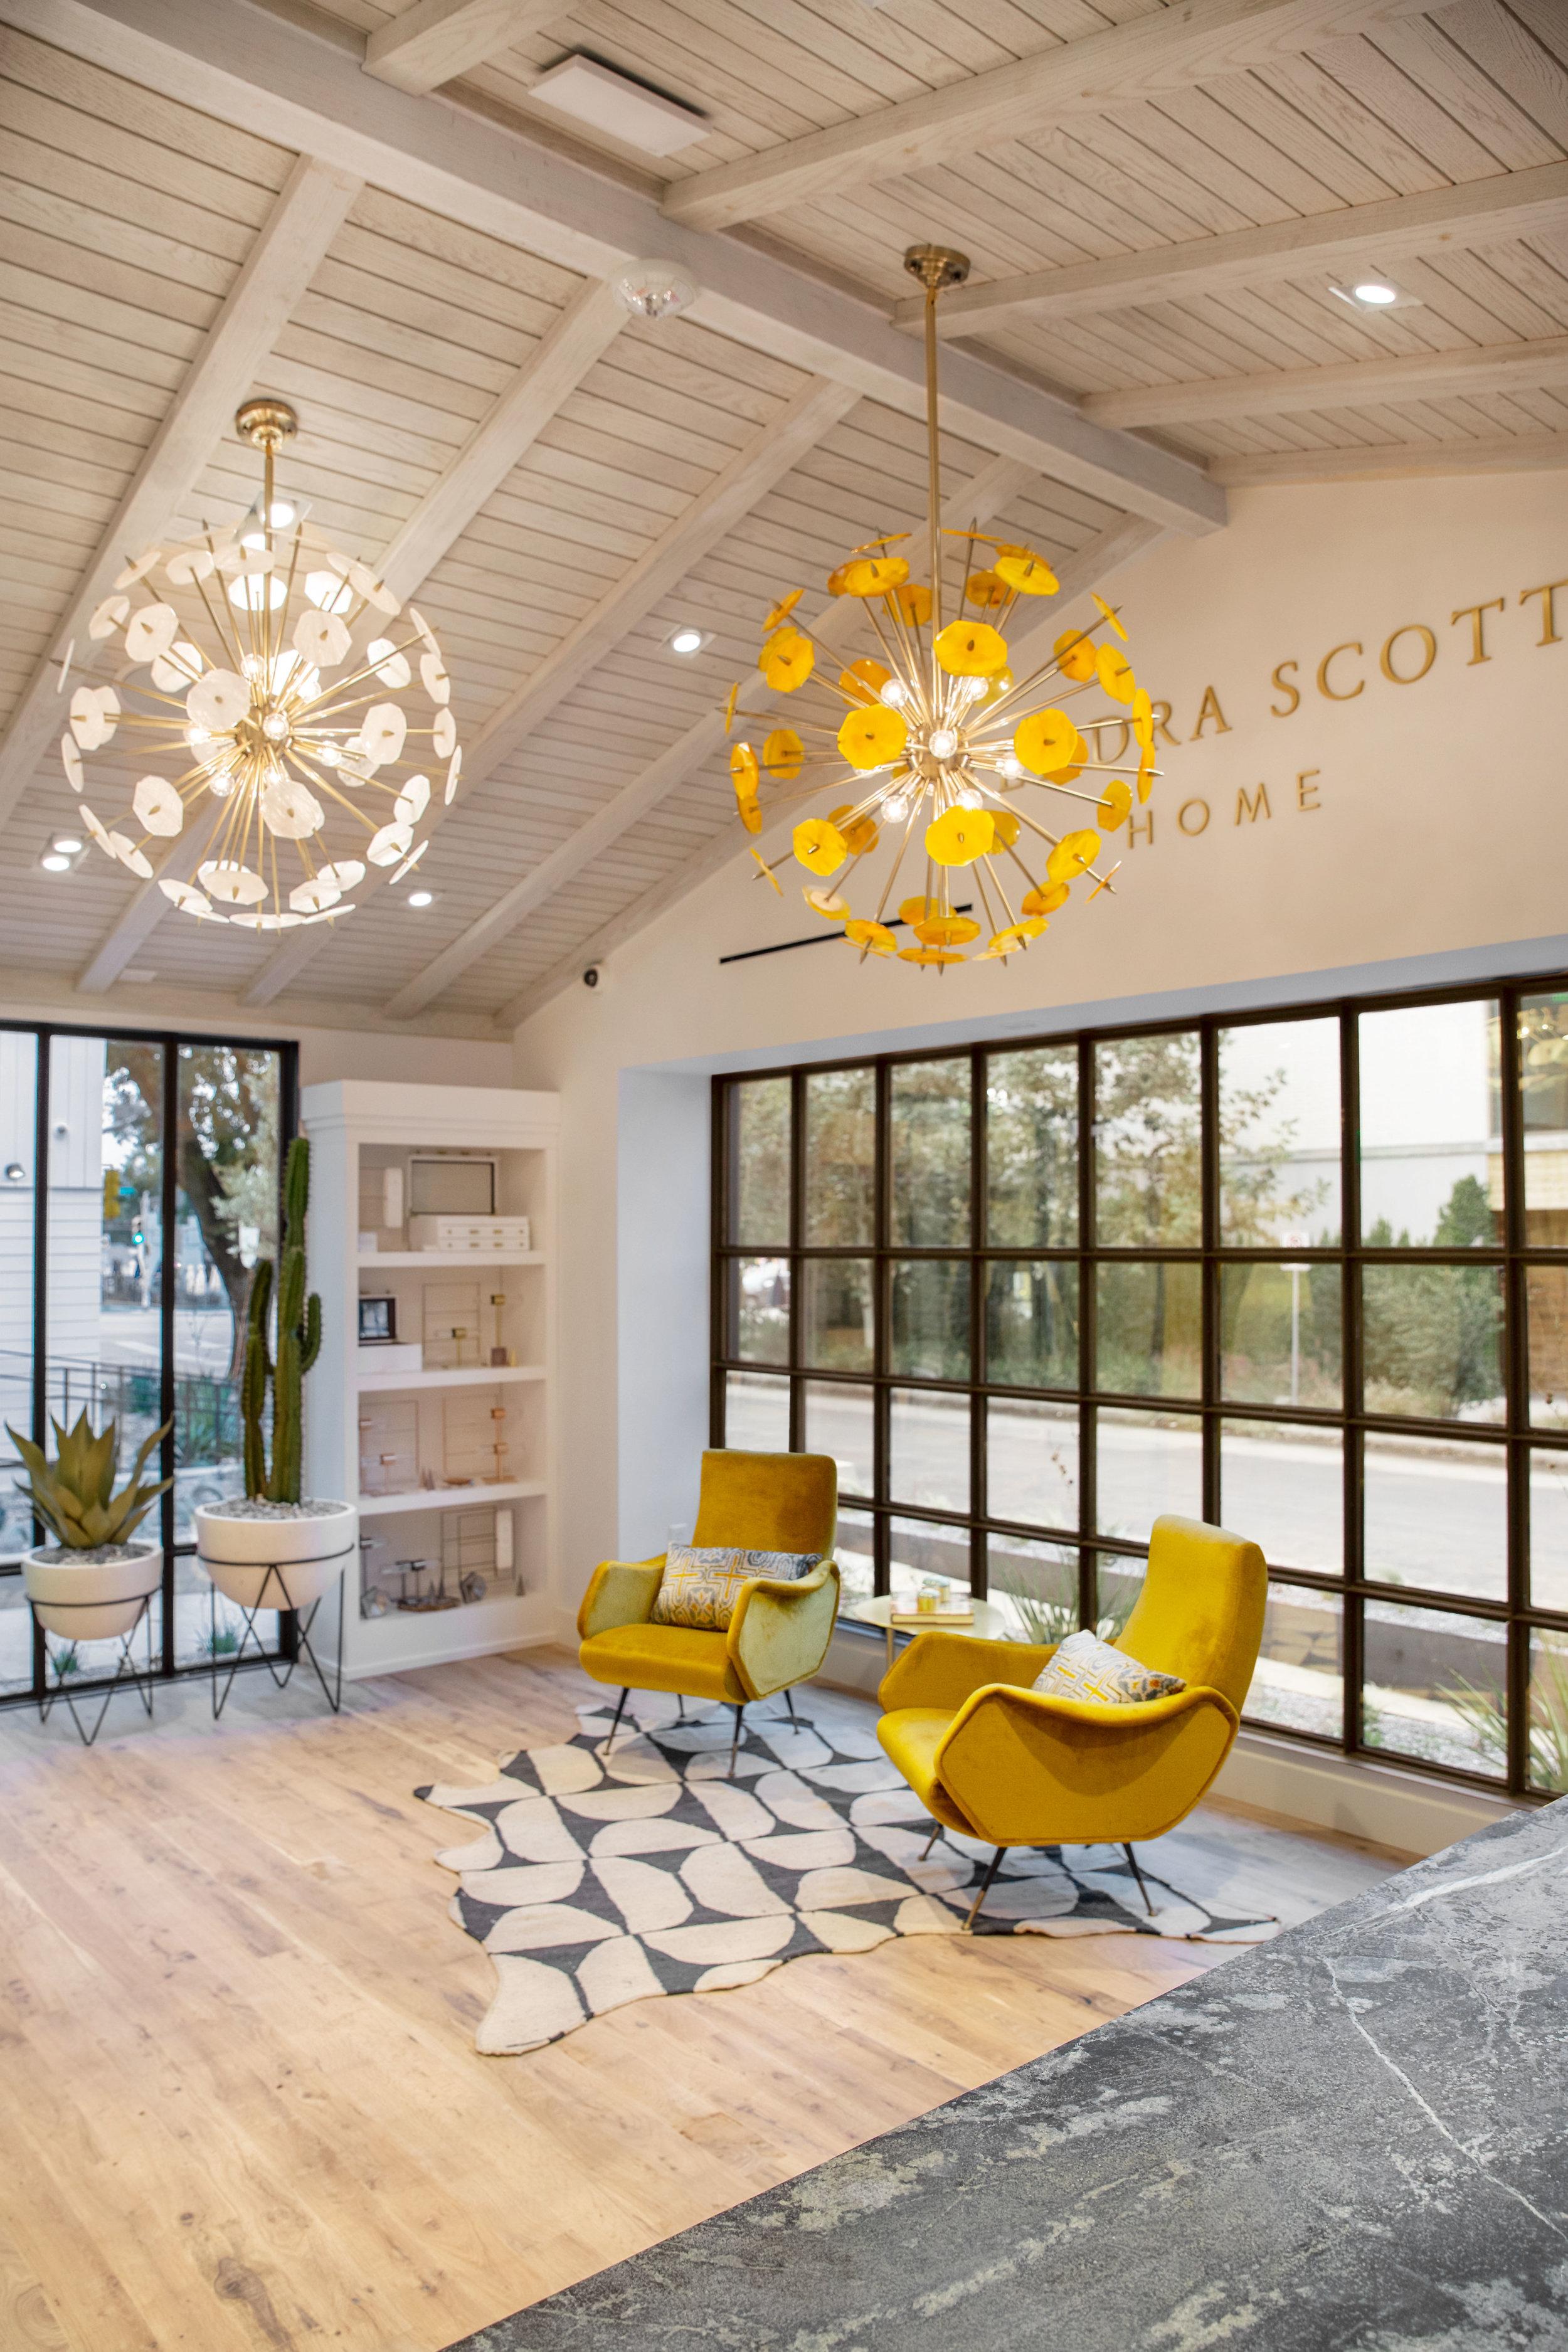 KendraScott-SouthCongressStore-Home